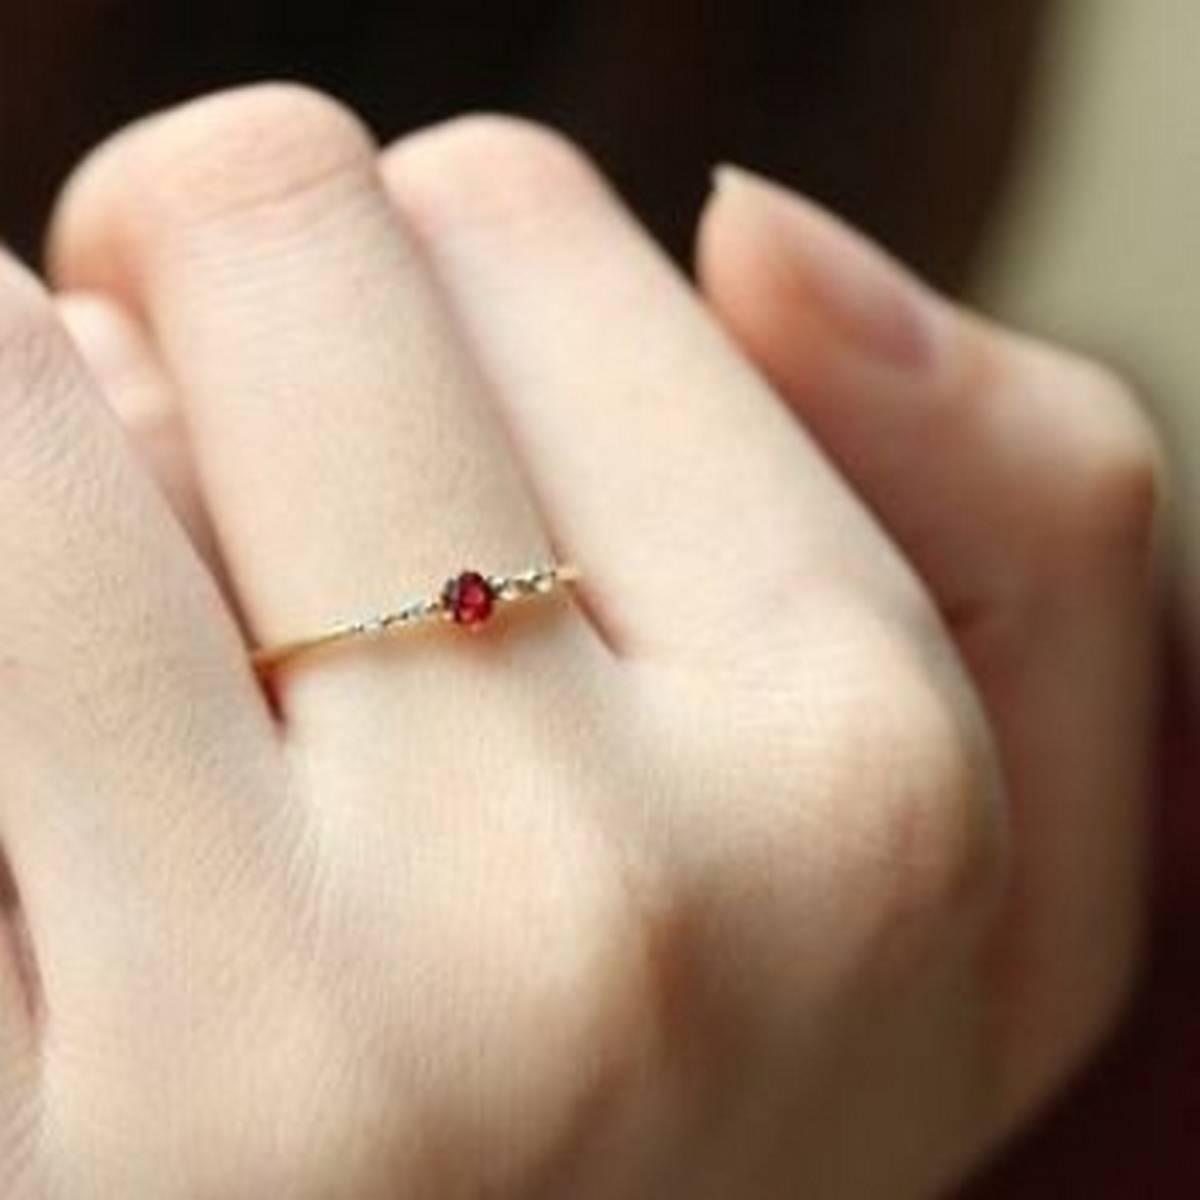 Big Diamond Crystal Rhinestone Ladies Wedding Finger Ring Women Engagement Decoration Girl Sliver Pink Jewelry Rings